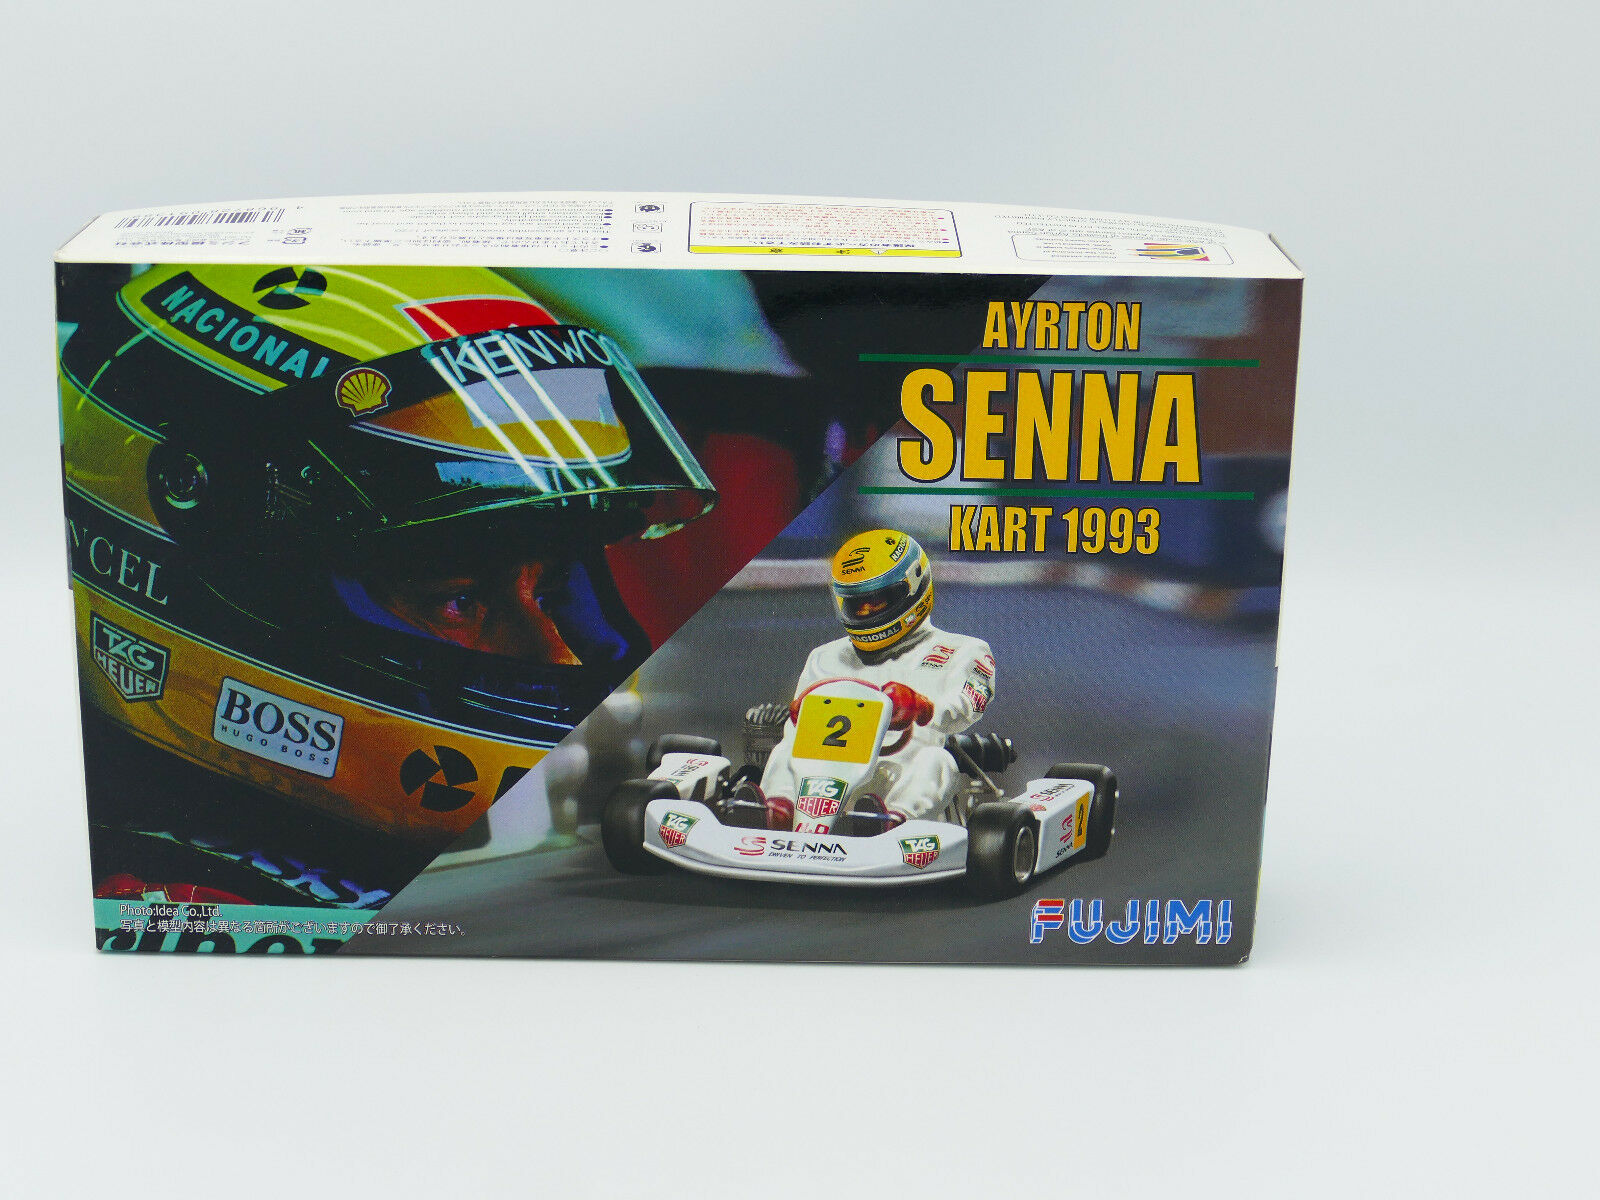 Fujimi KART Ayrton Senna Kart 1993 1 20 scale kit-Lot of 4